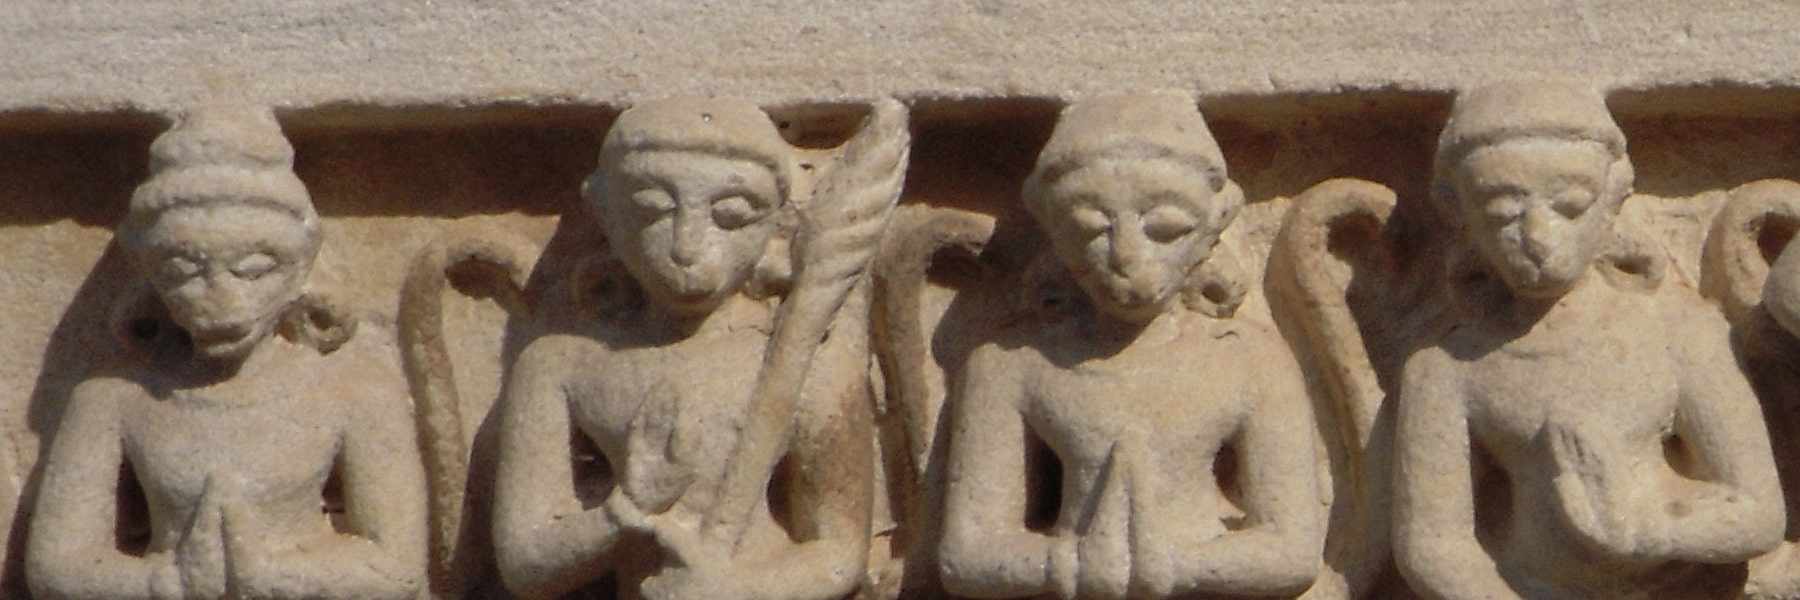 patanjali's paradigm, vedic civilization